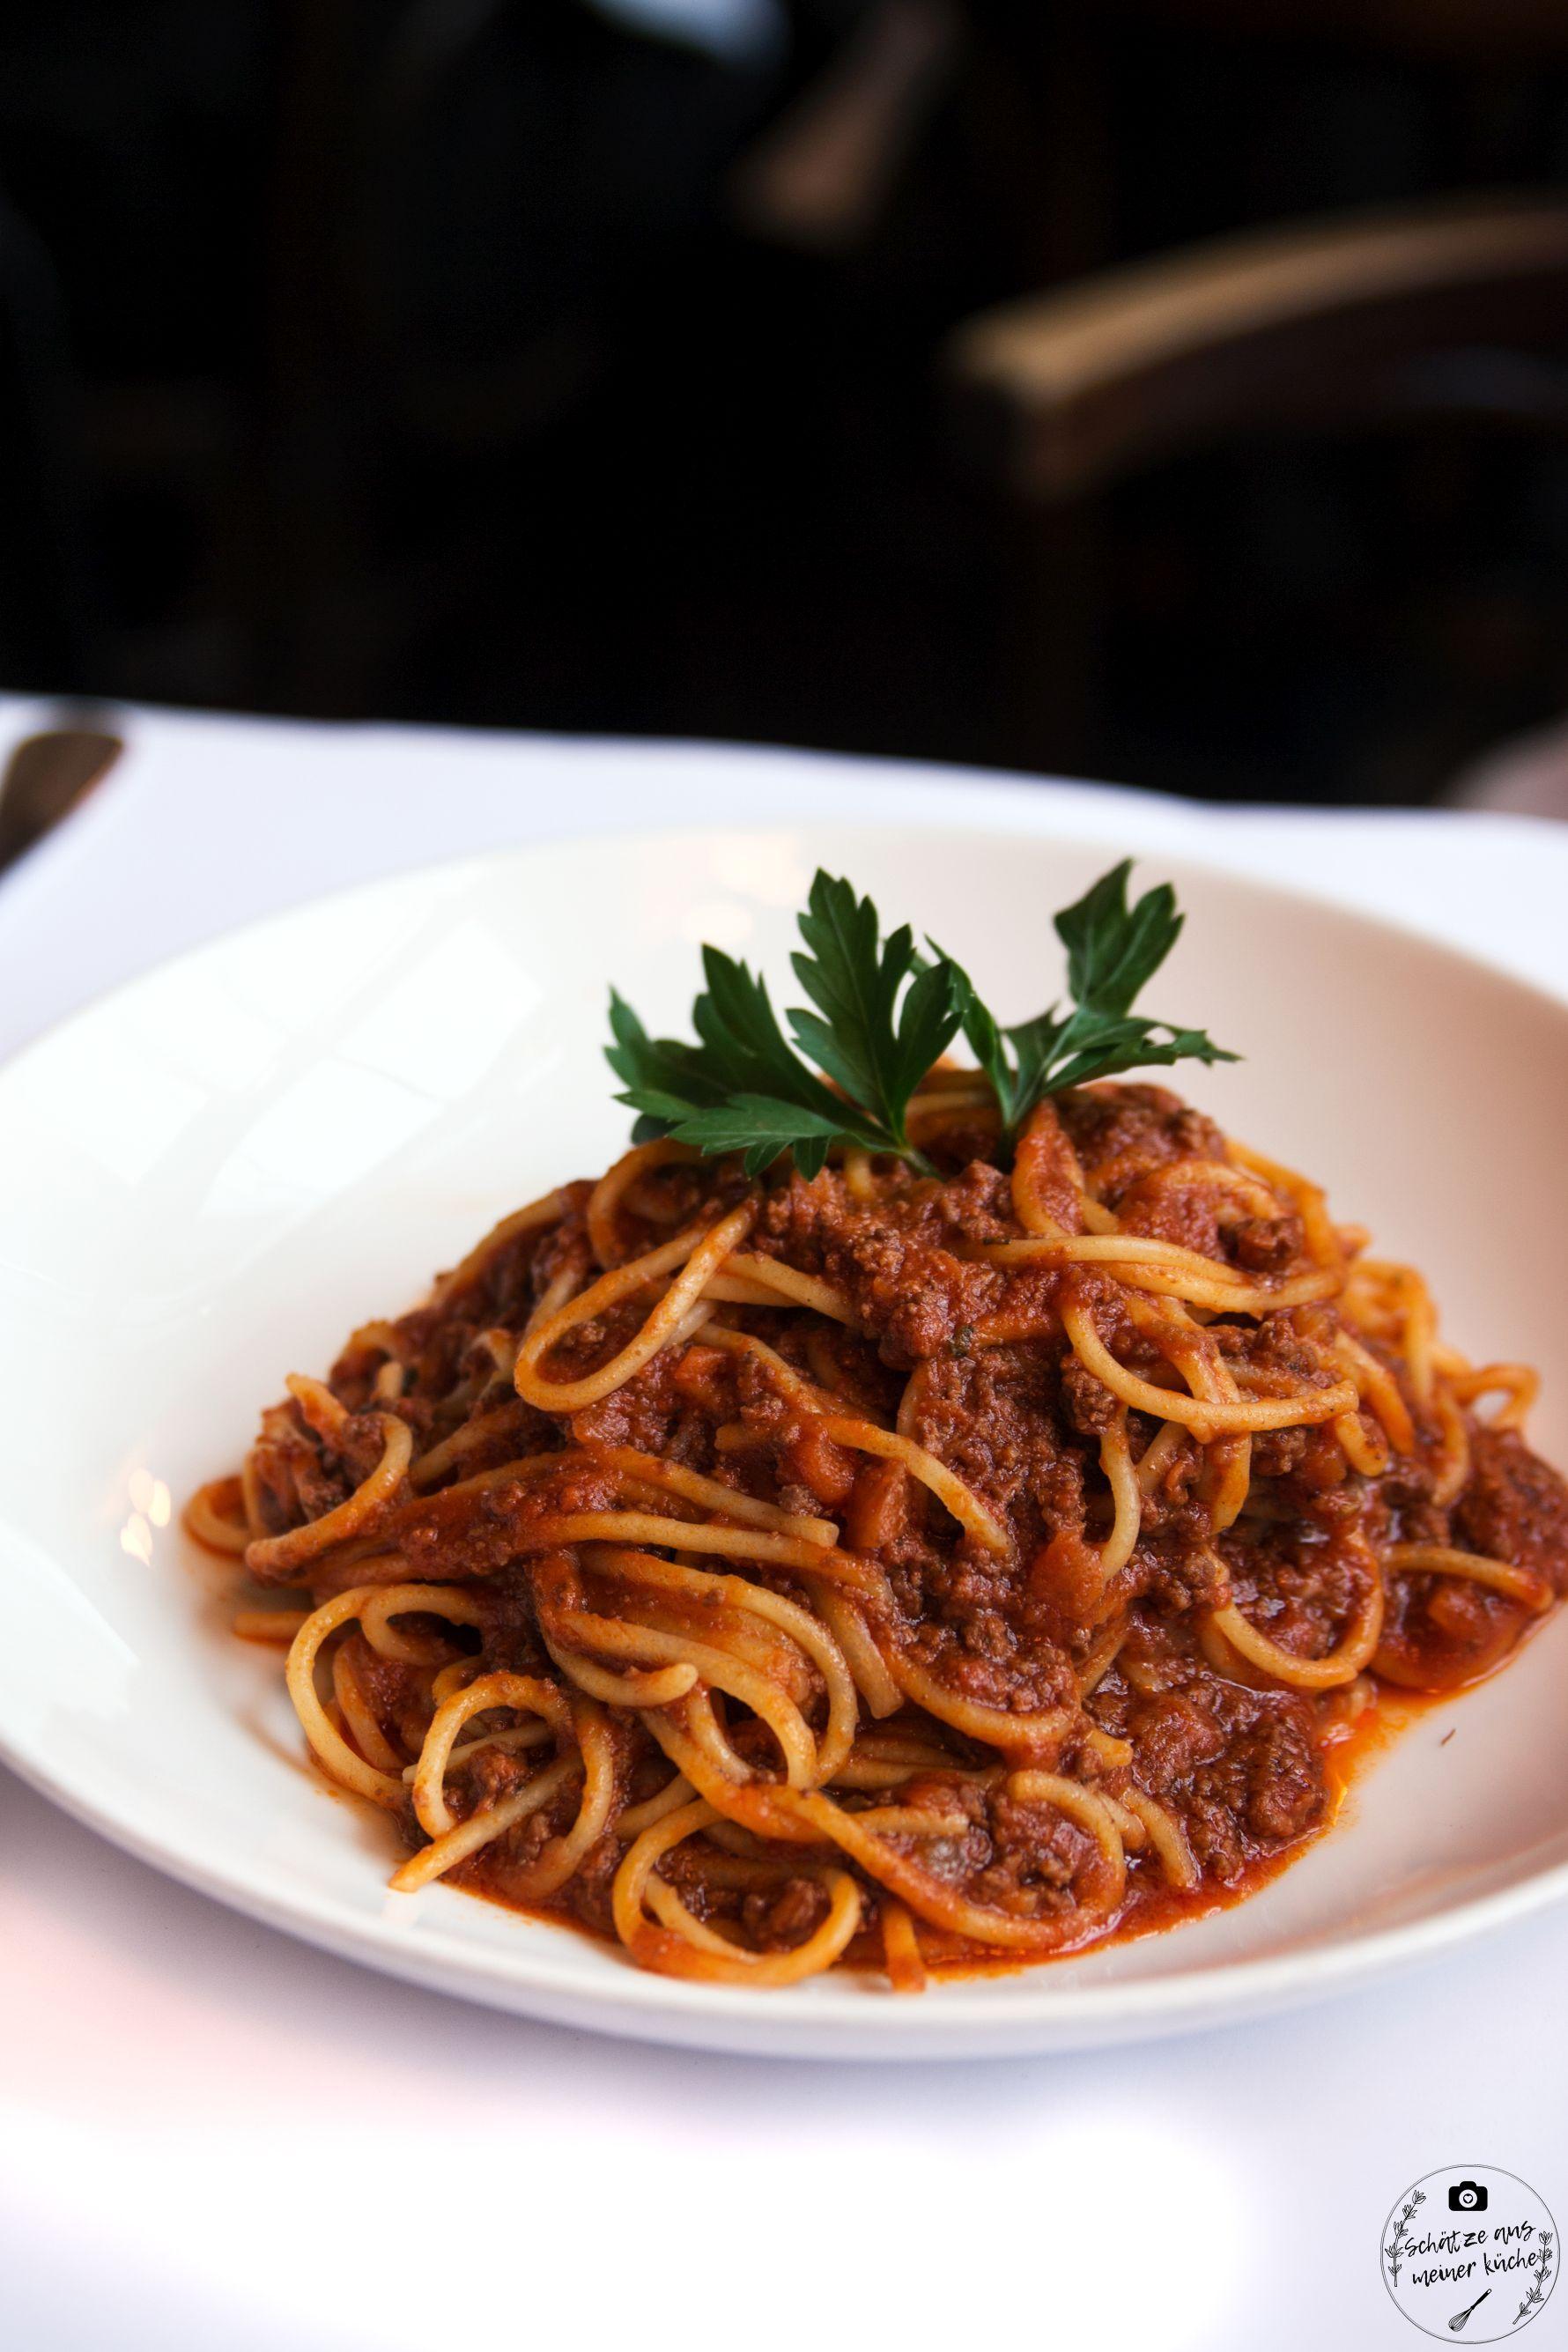 Spaghetti Bolognese Brenner Restaurant Pasta Grill München